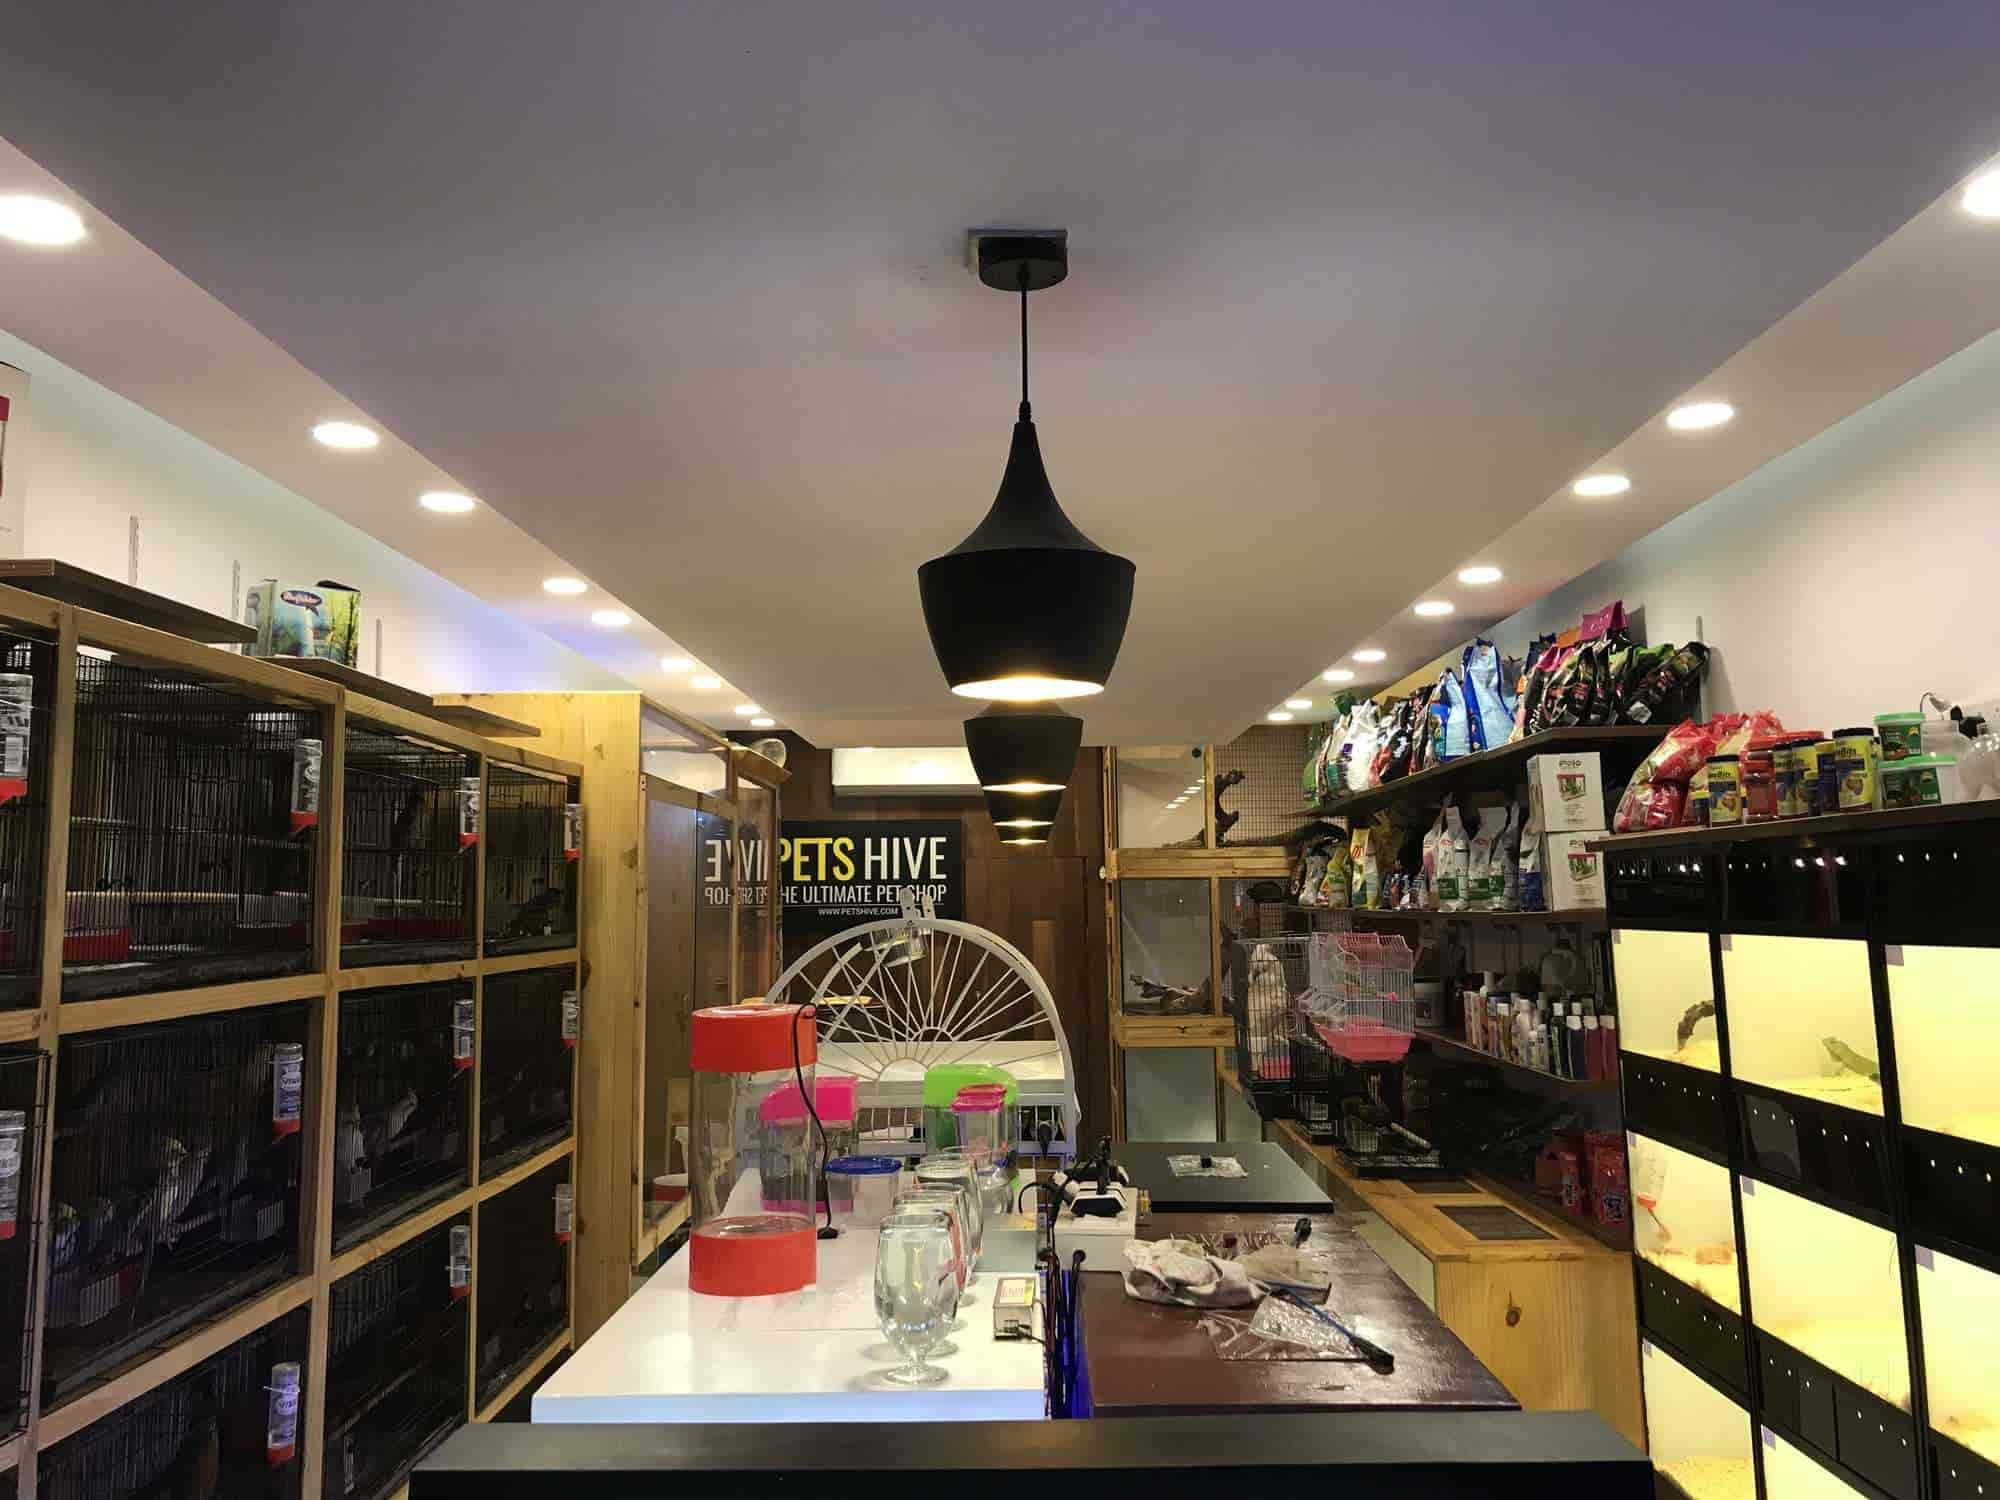 Pets Hive, Nettoor - Pet Shops in Ernakulam - Justdial